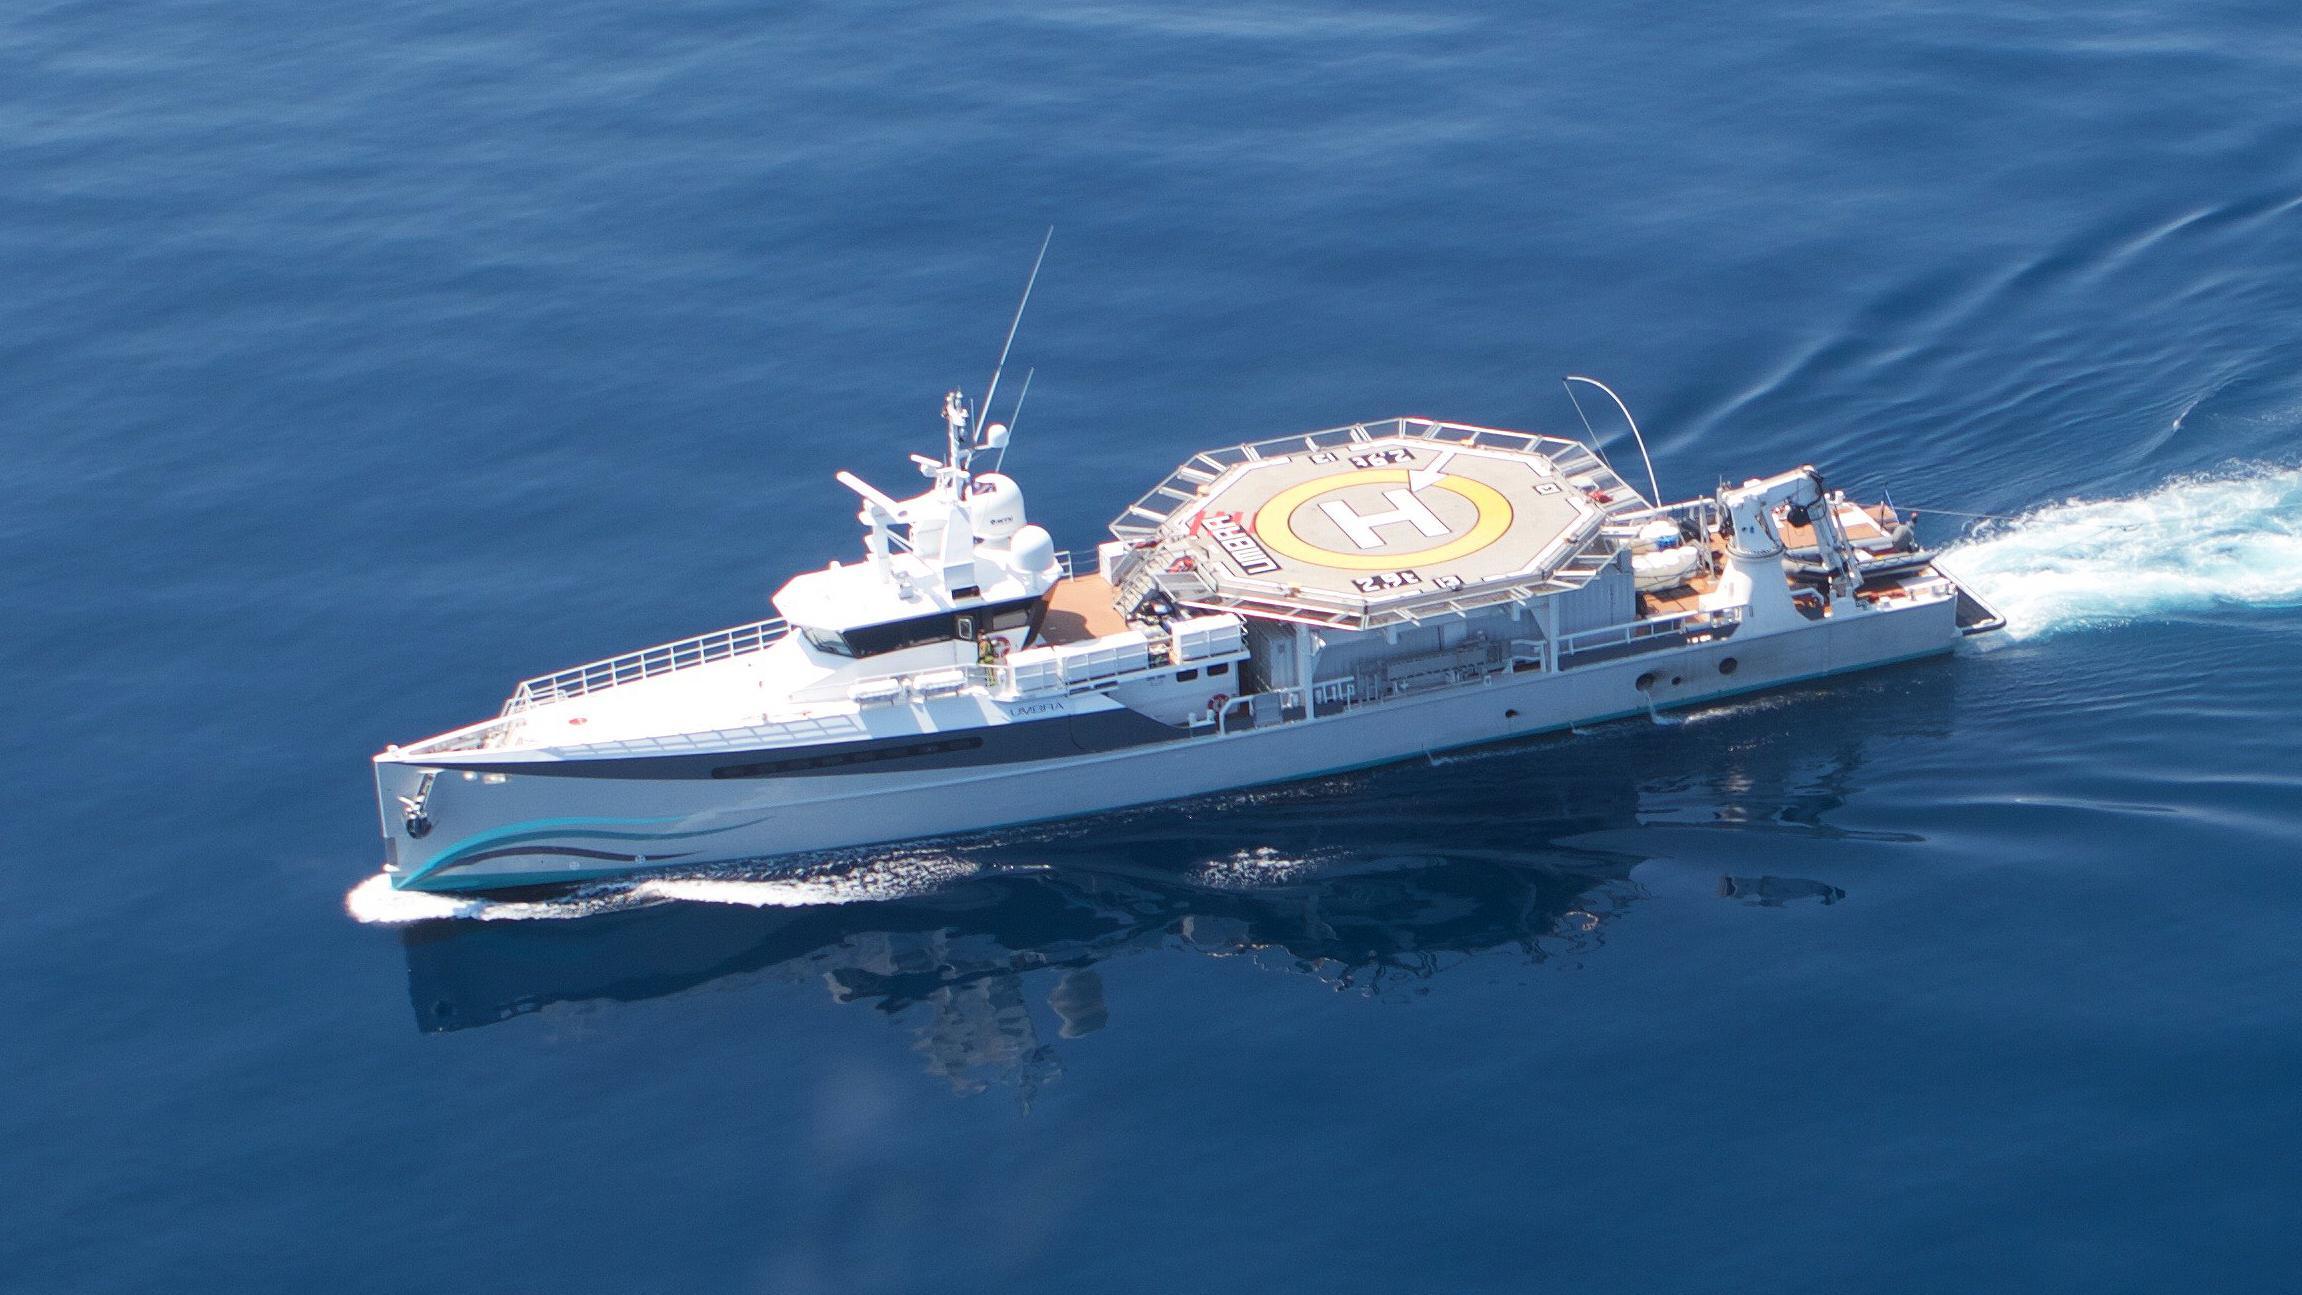 umbra-explorer-yacht-damen-2008-54m-aerial-cruising